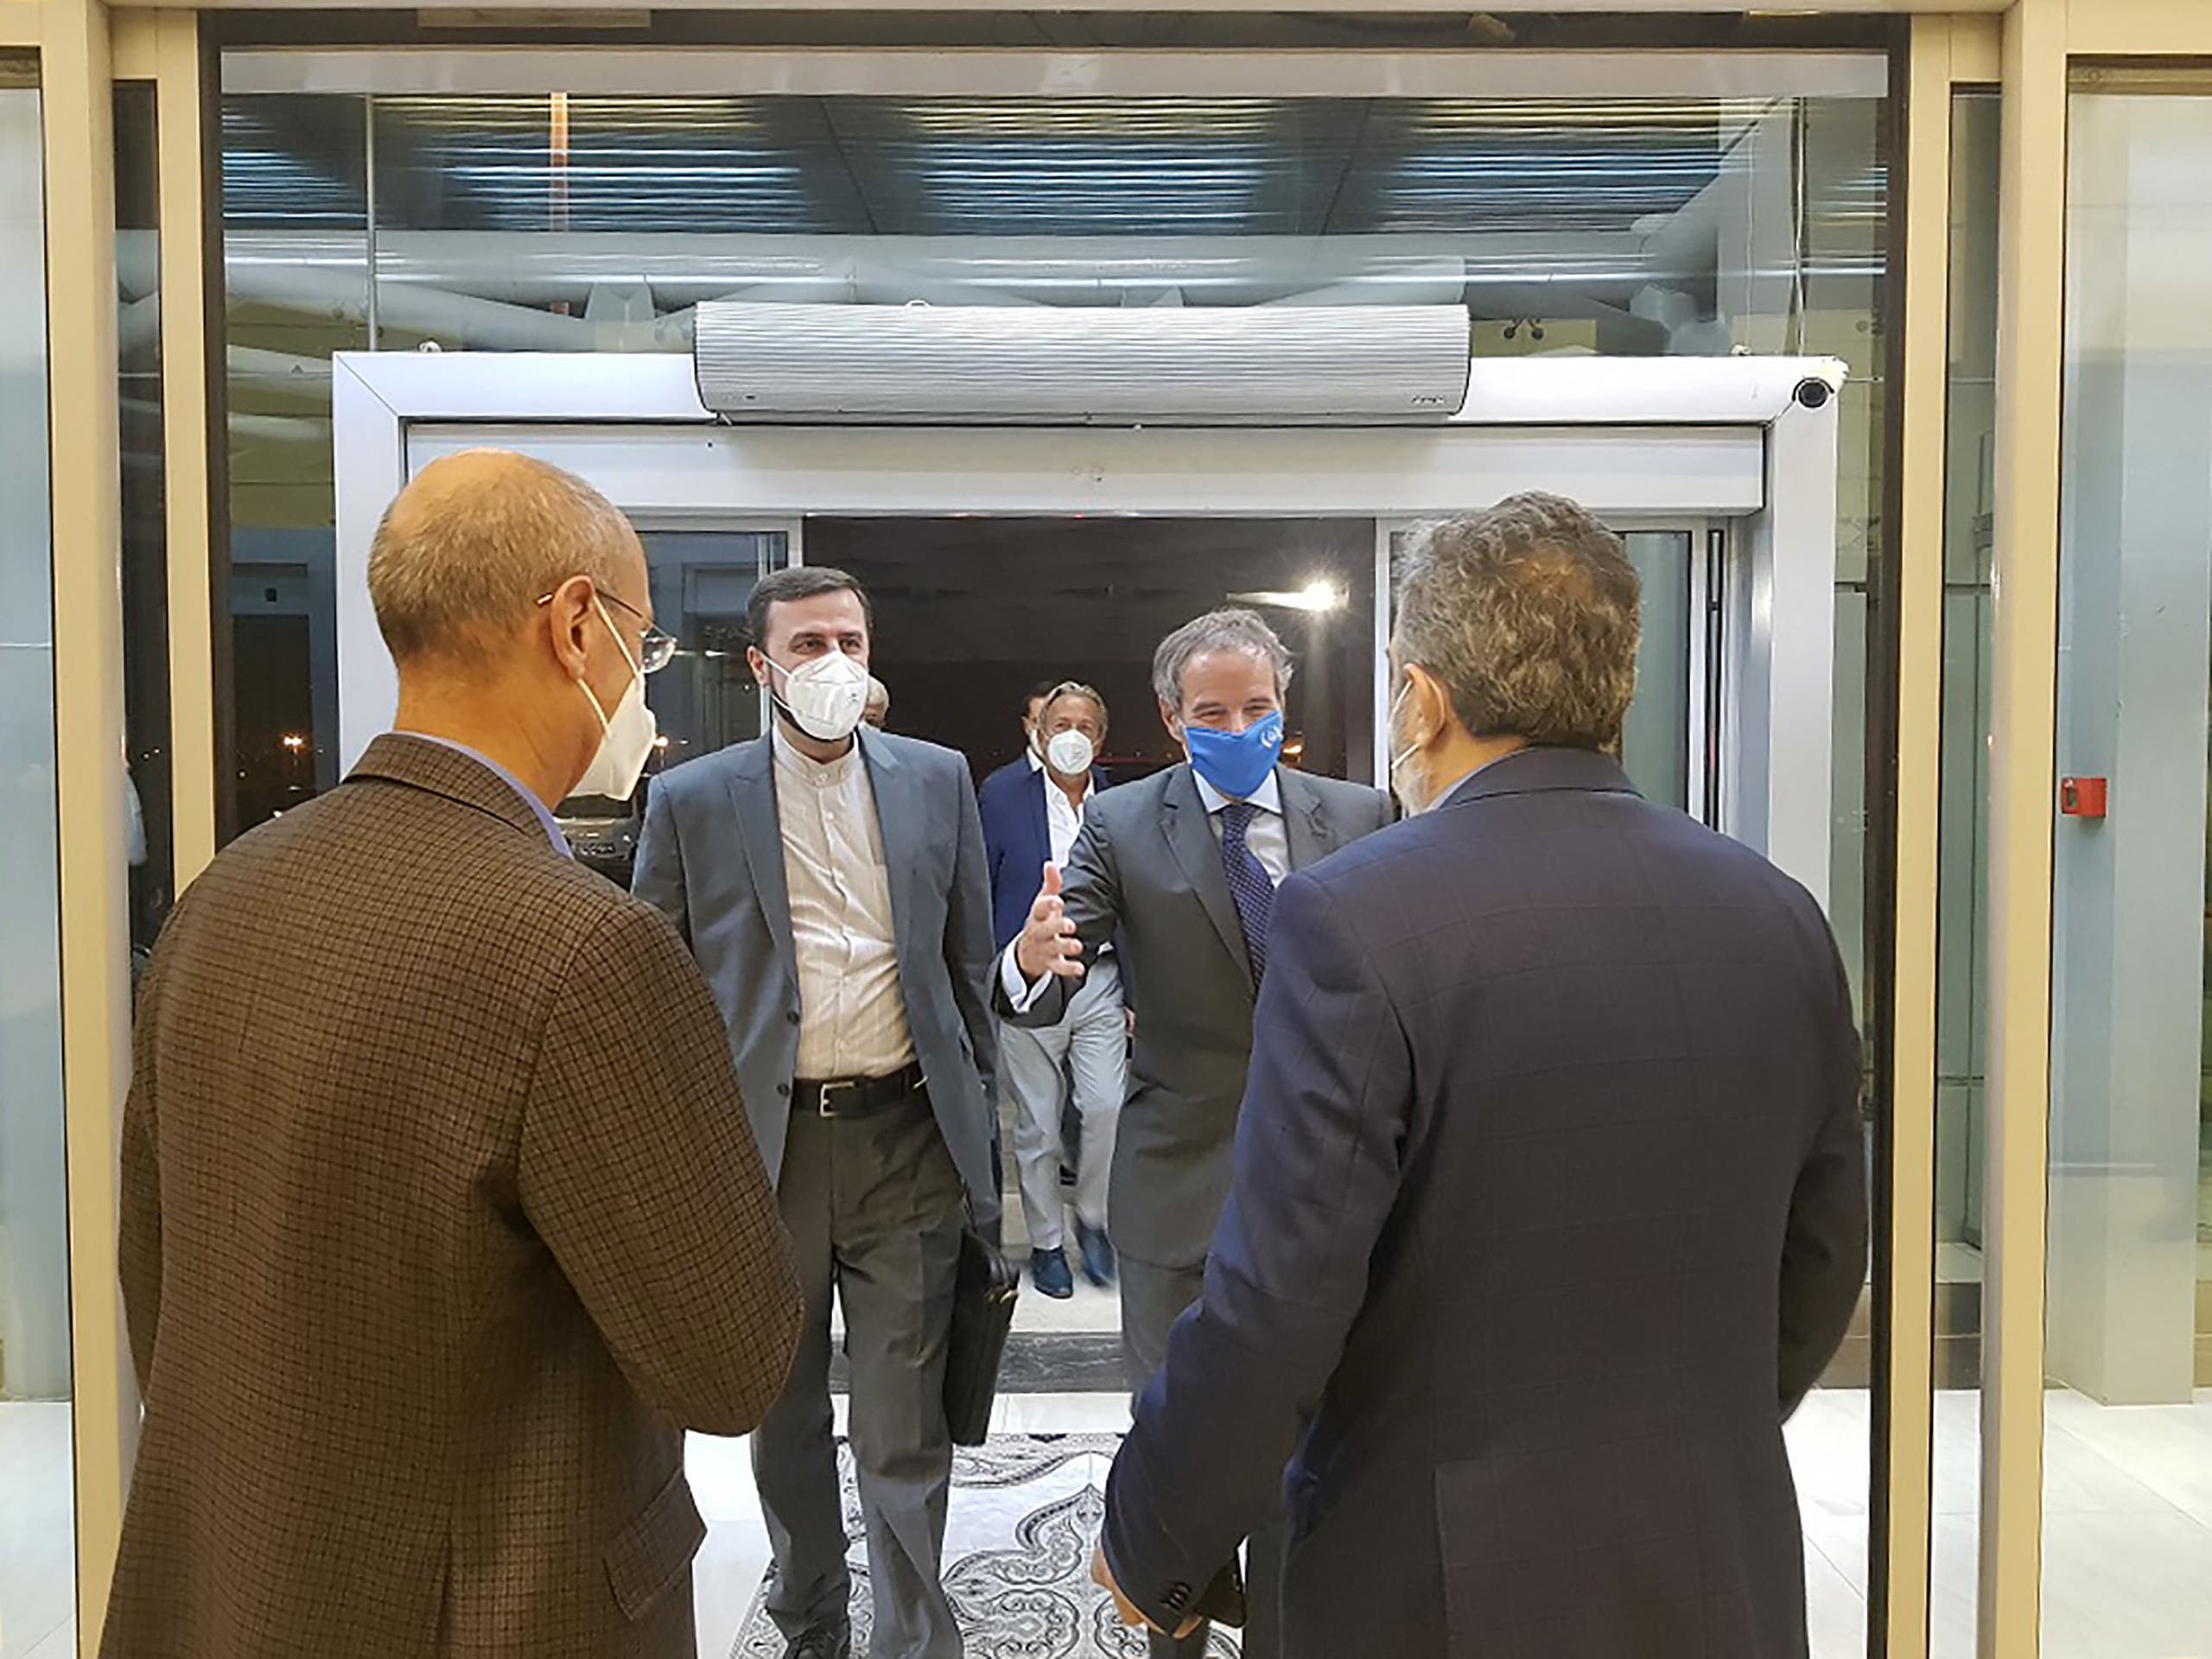 رافاييل غروسي في طهران يوم الأحد 12 سبتمبر 2021 (فرانس برس)